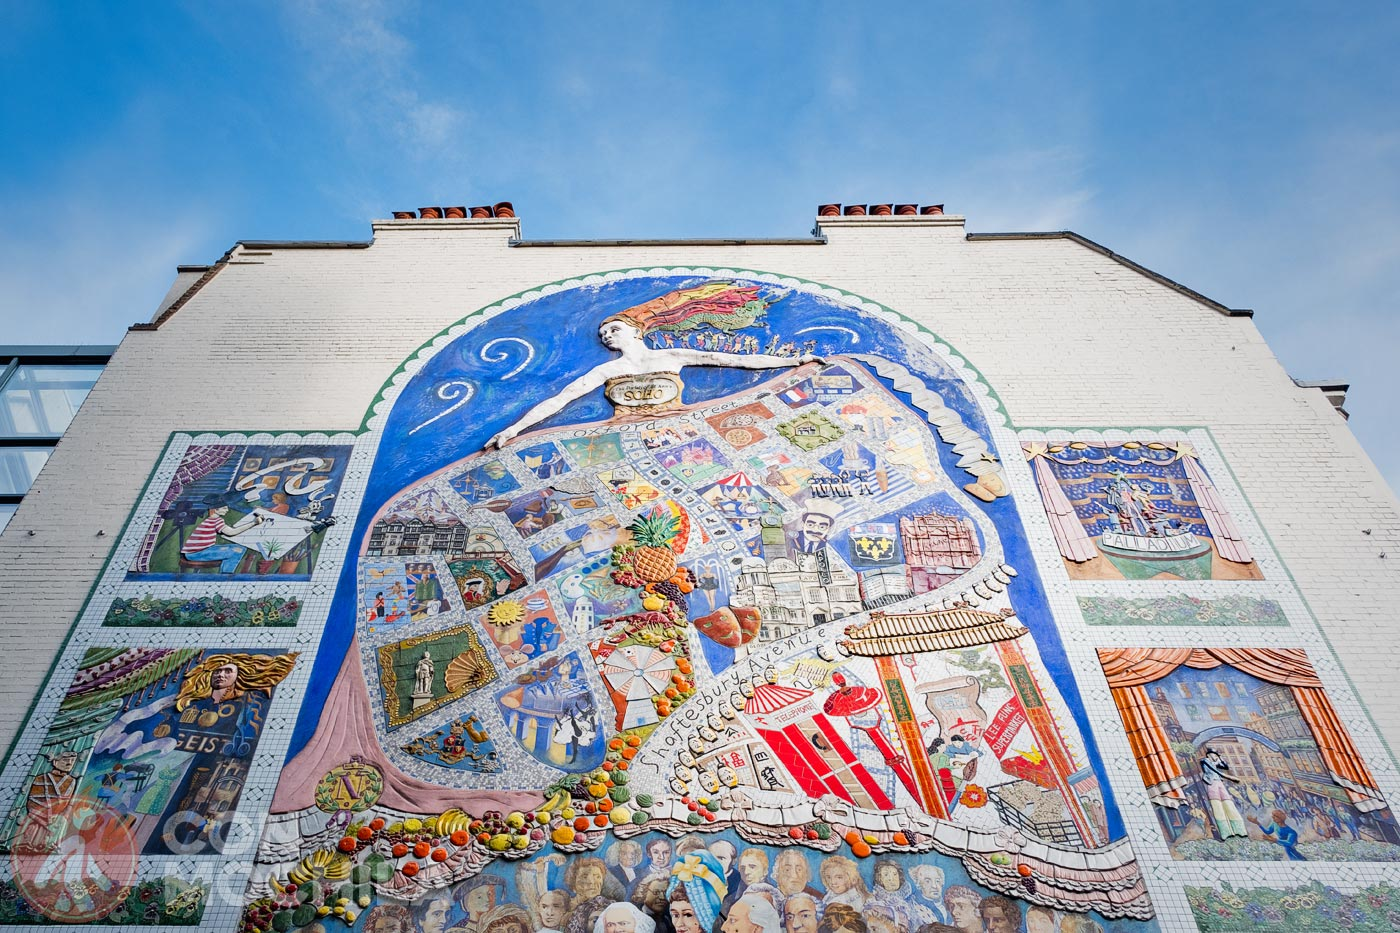 Mural en el Soho de Londres